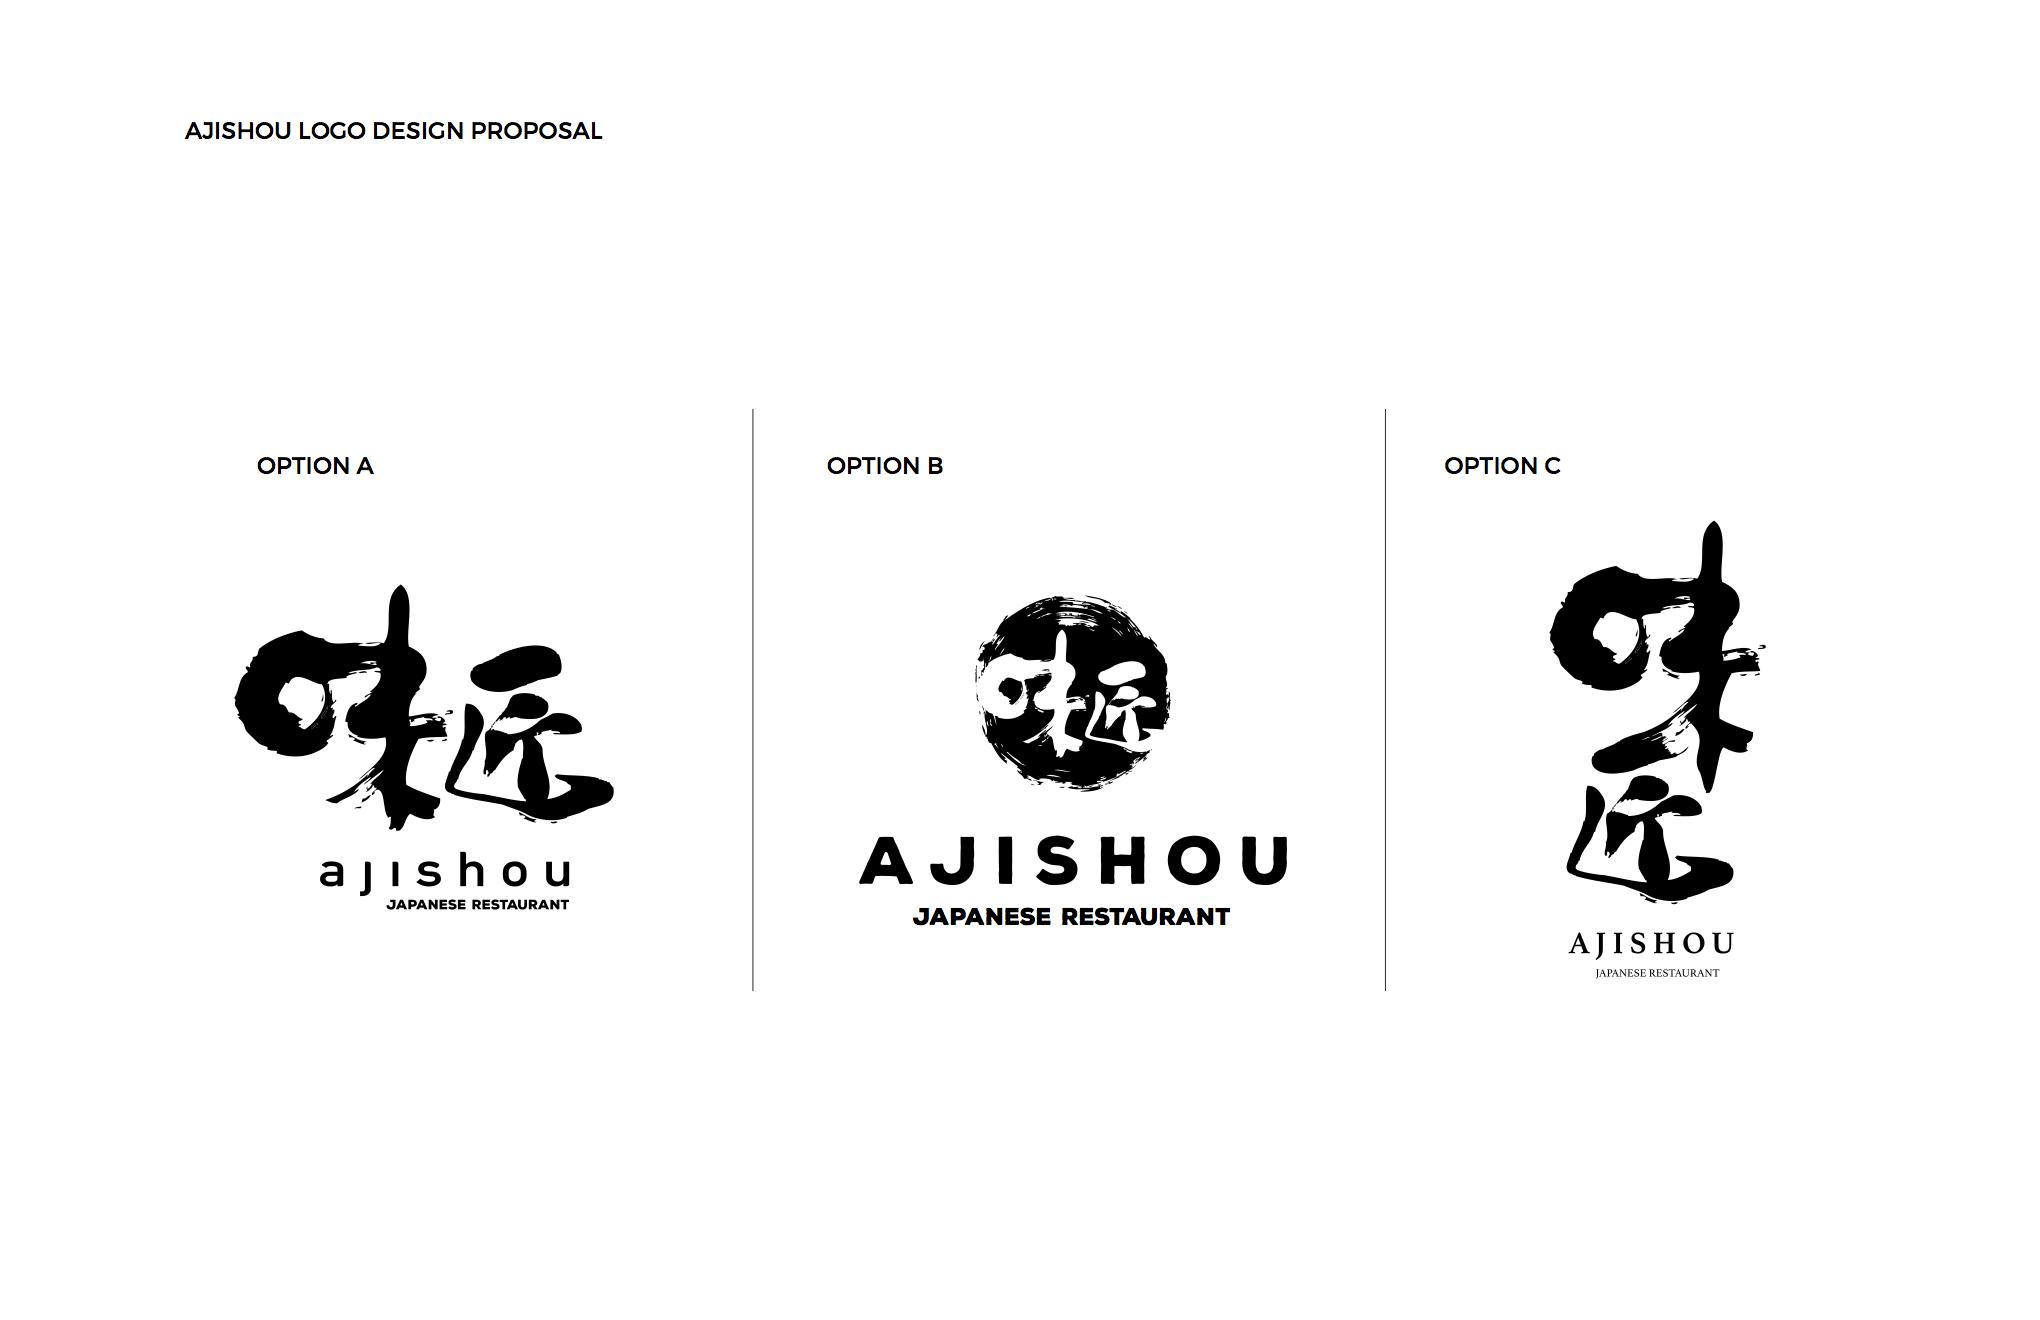 Ajishou Logo Design - Japanese Restaurant Design